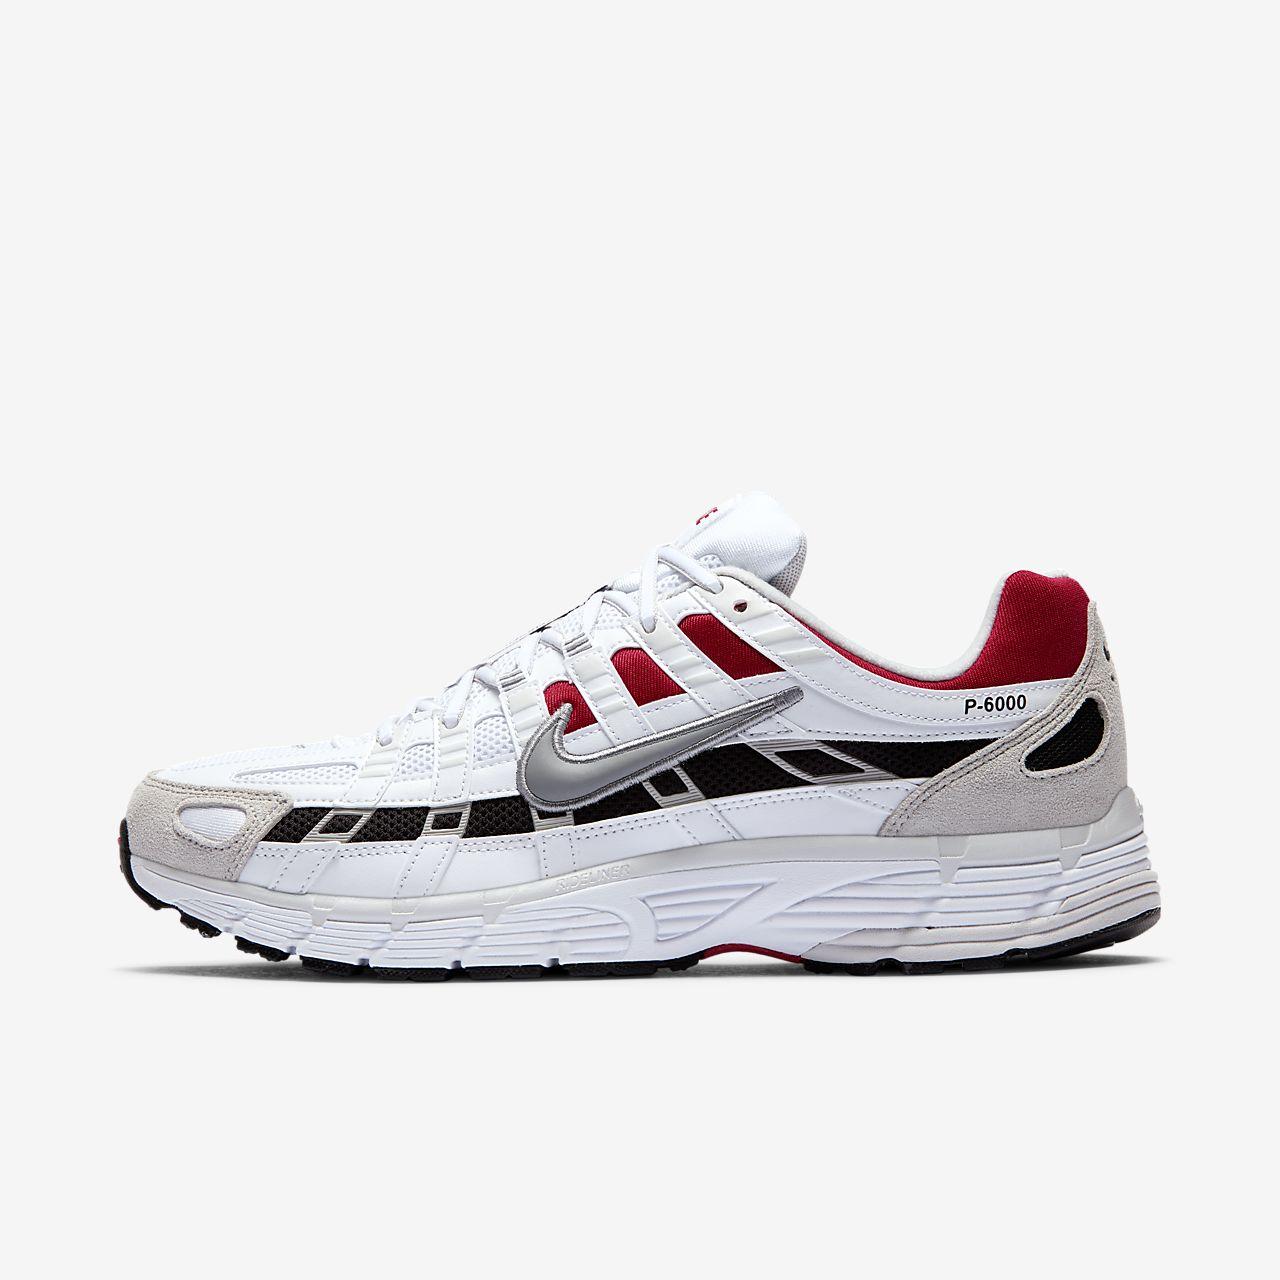 Мужские кроссовки Nike P-6000